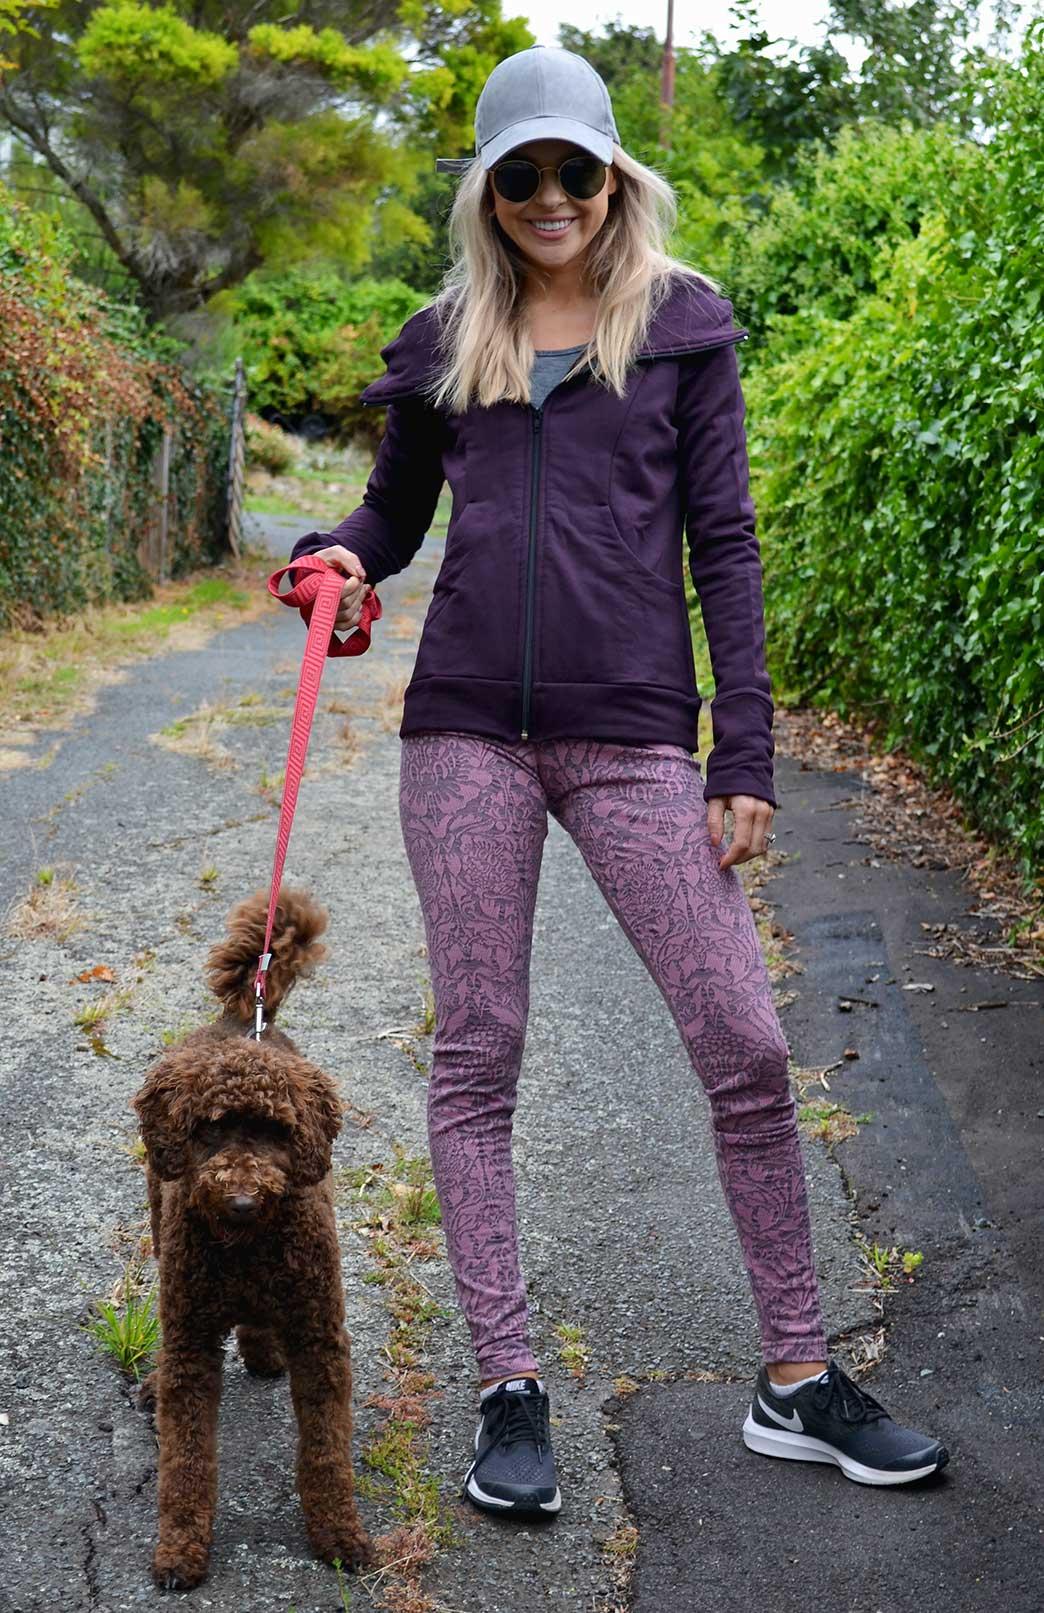 Leggings - Patterned - Women's Pink Floral Patterned Leggings with elastic waistband - Smitten Merino Tasmania Australia